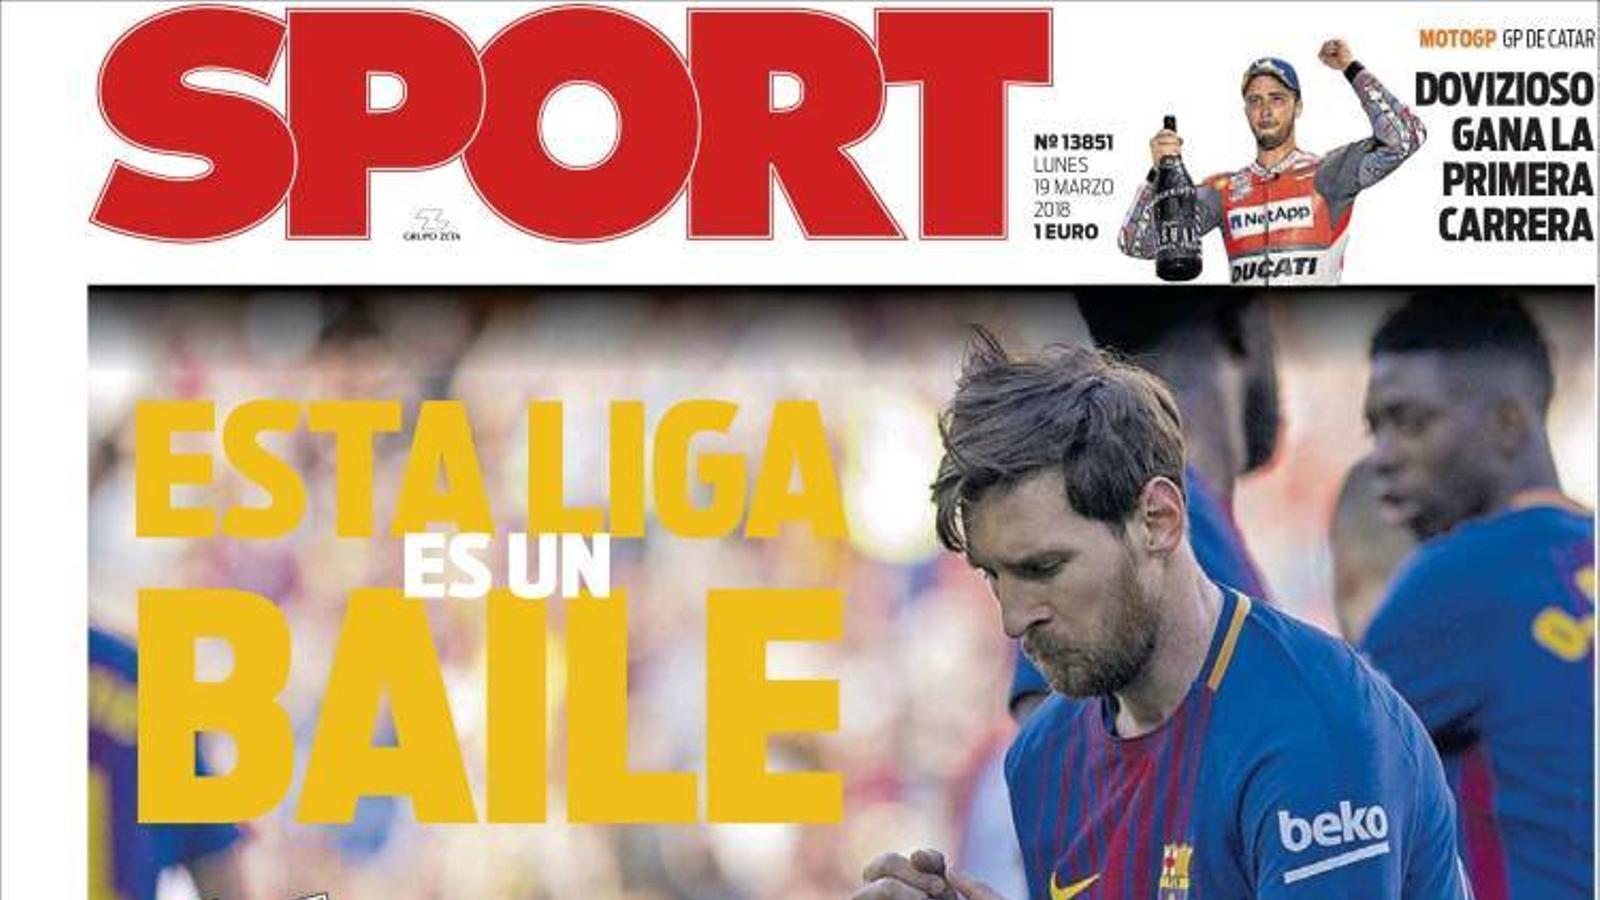 Portada 19 març 2018 Sport